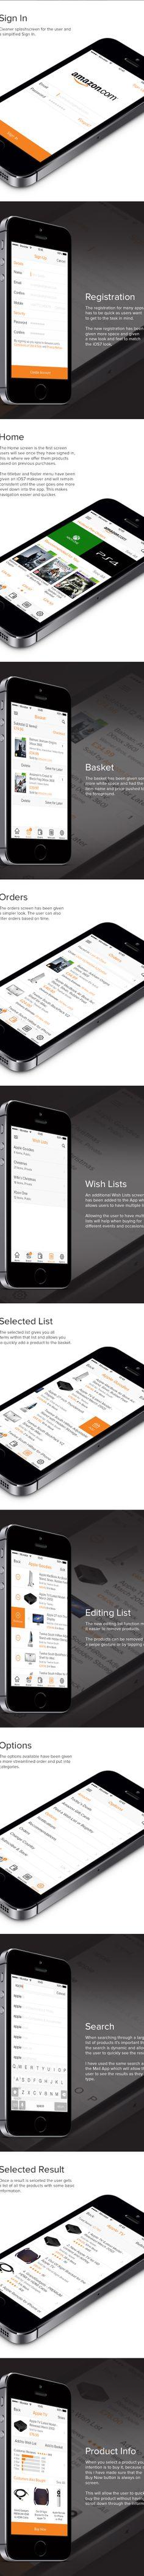 Amazon - iOS7 Redesign by Michael Shanks, via Behance